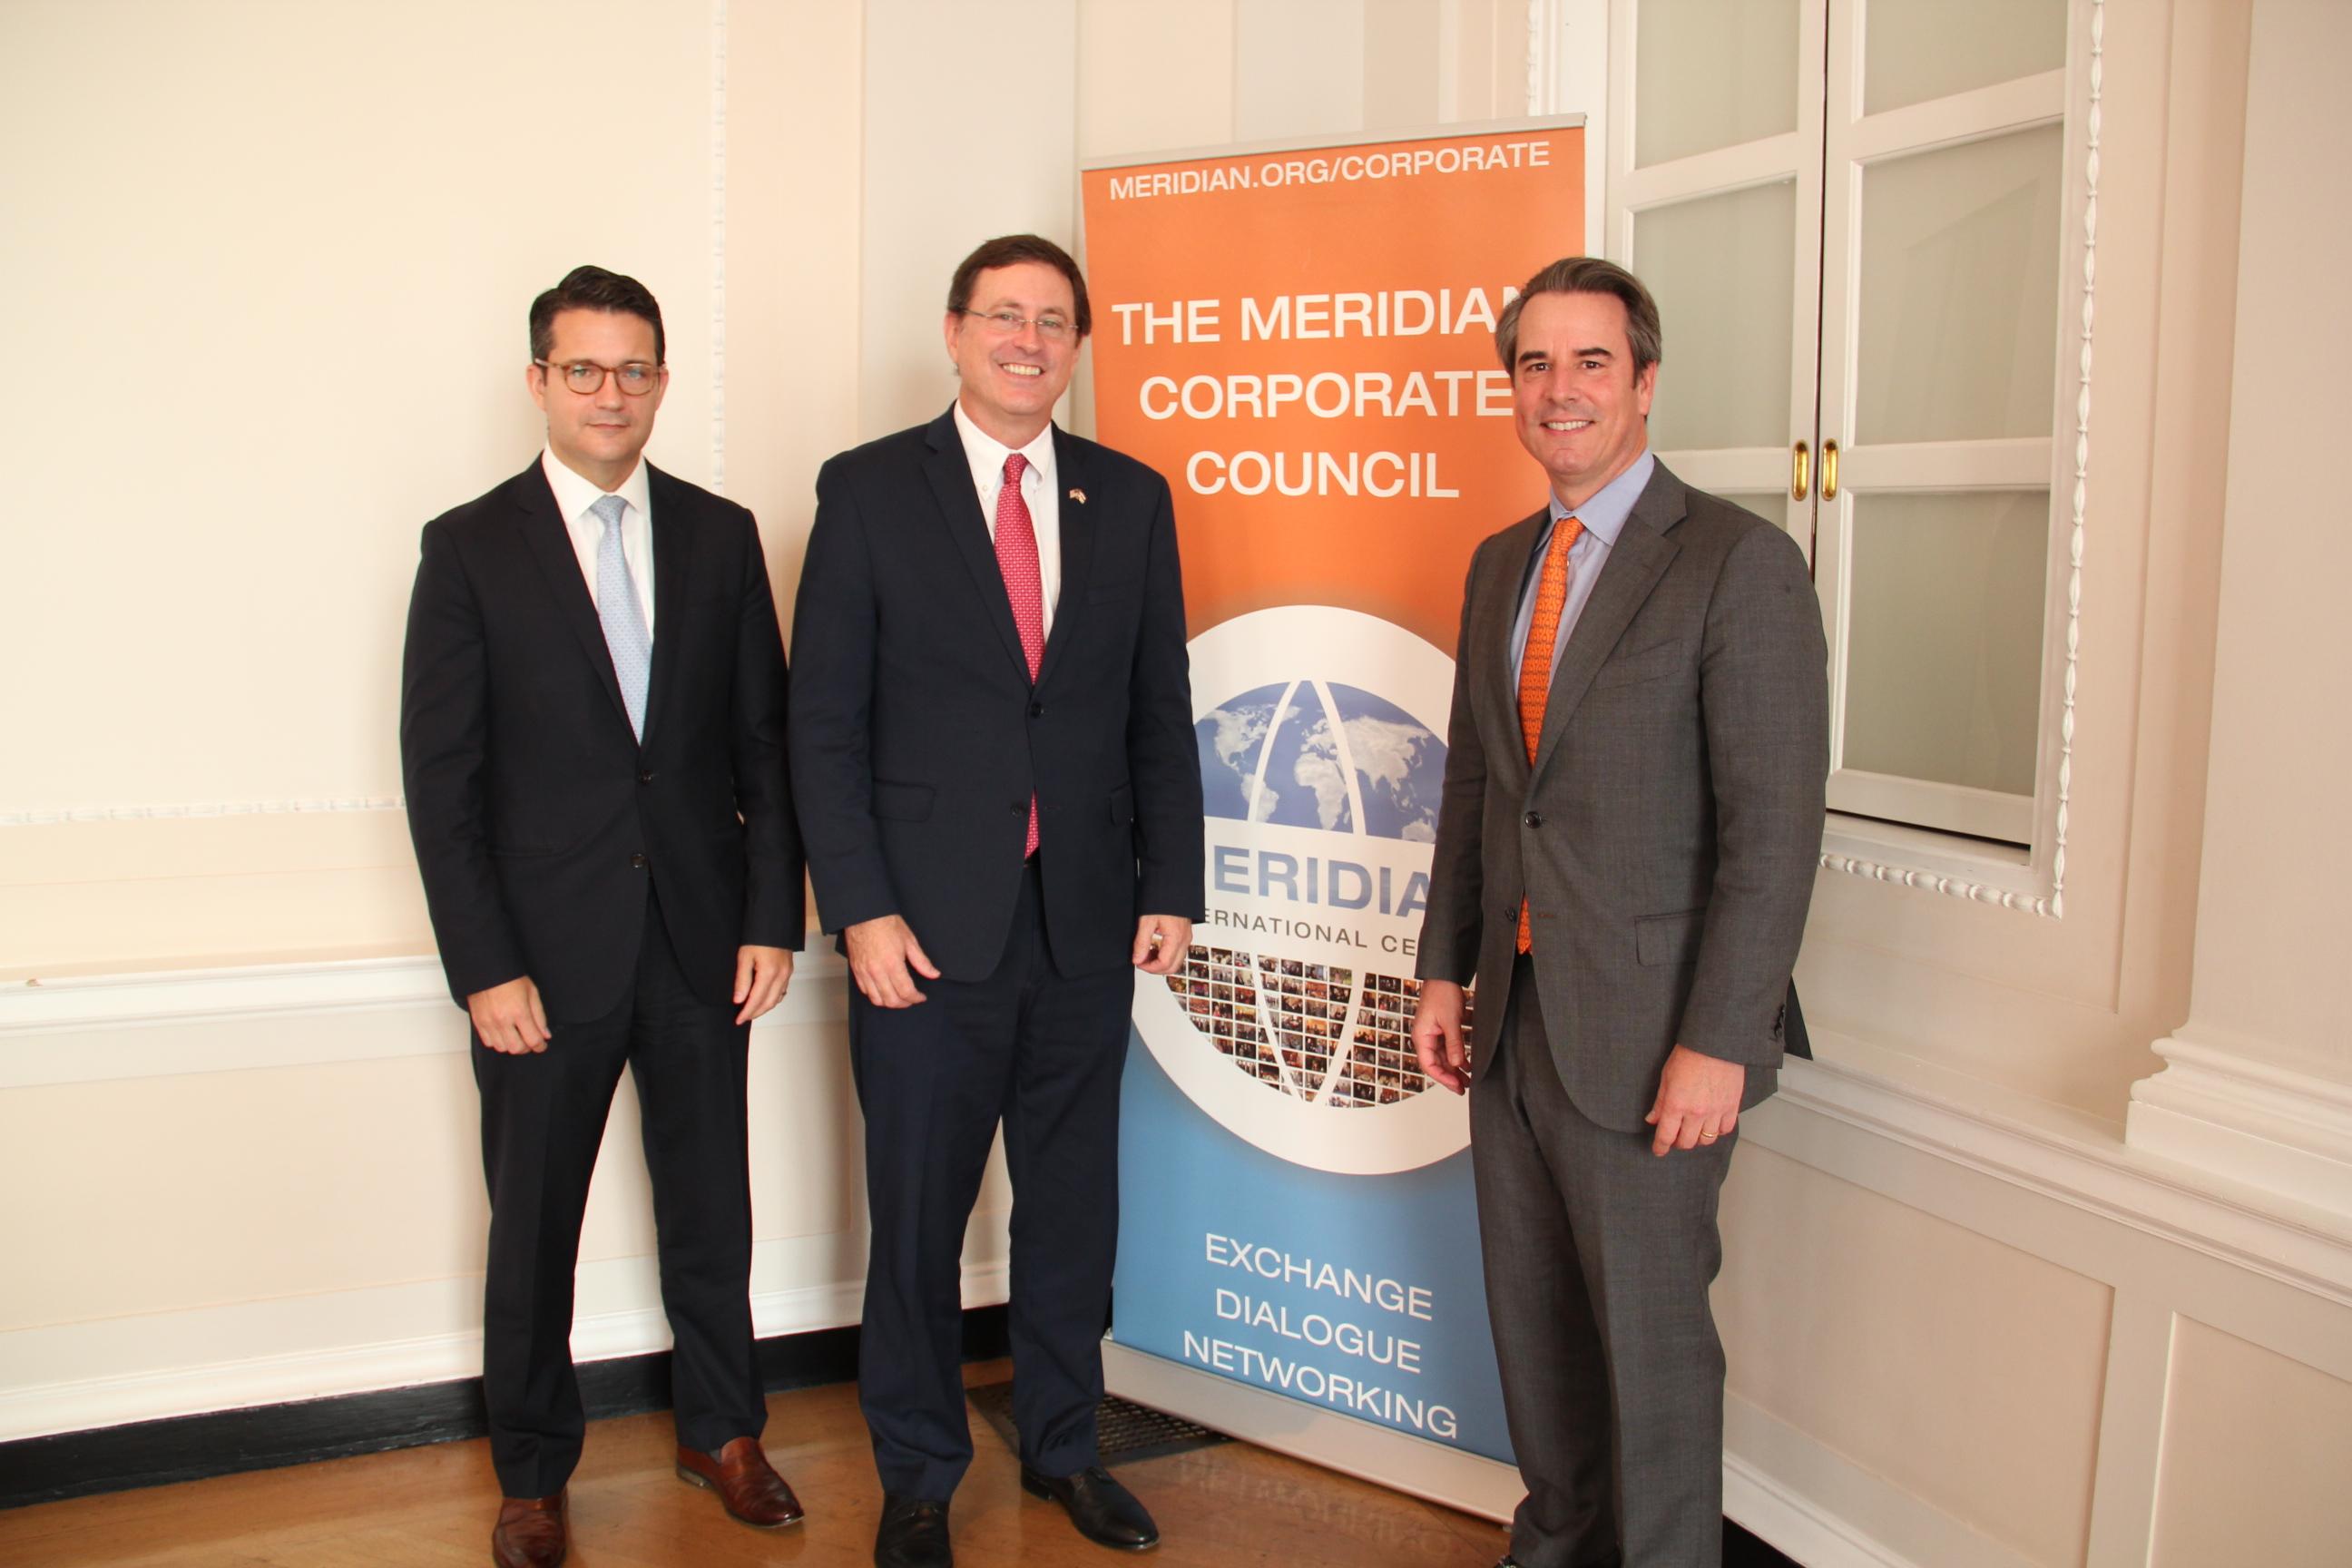 Mr. Jason Grove, Ambassador Macaya, Ambassador Holliday